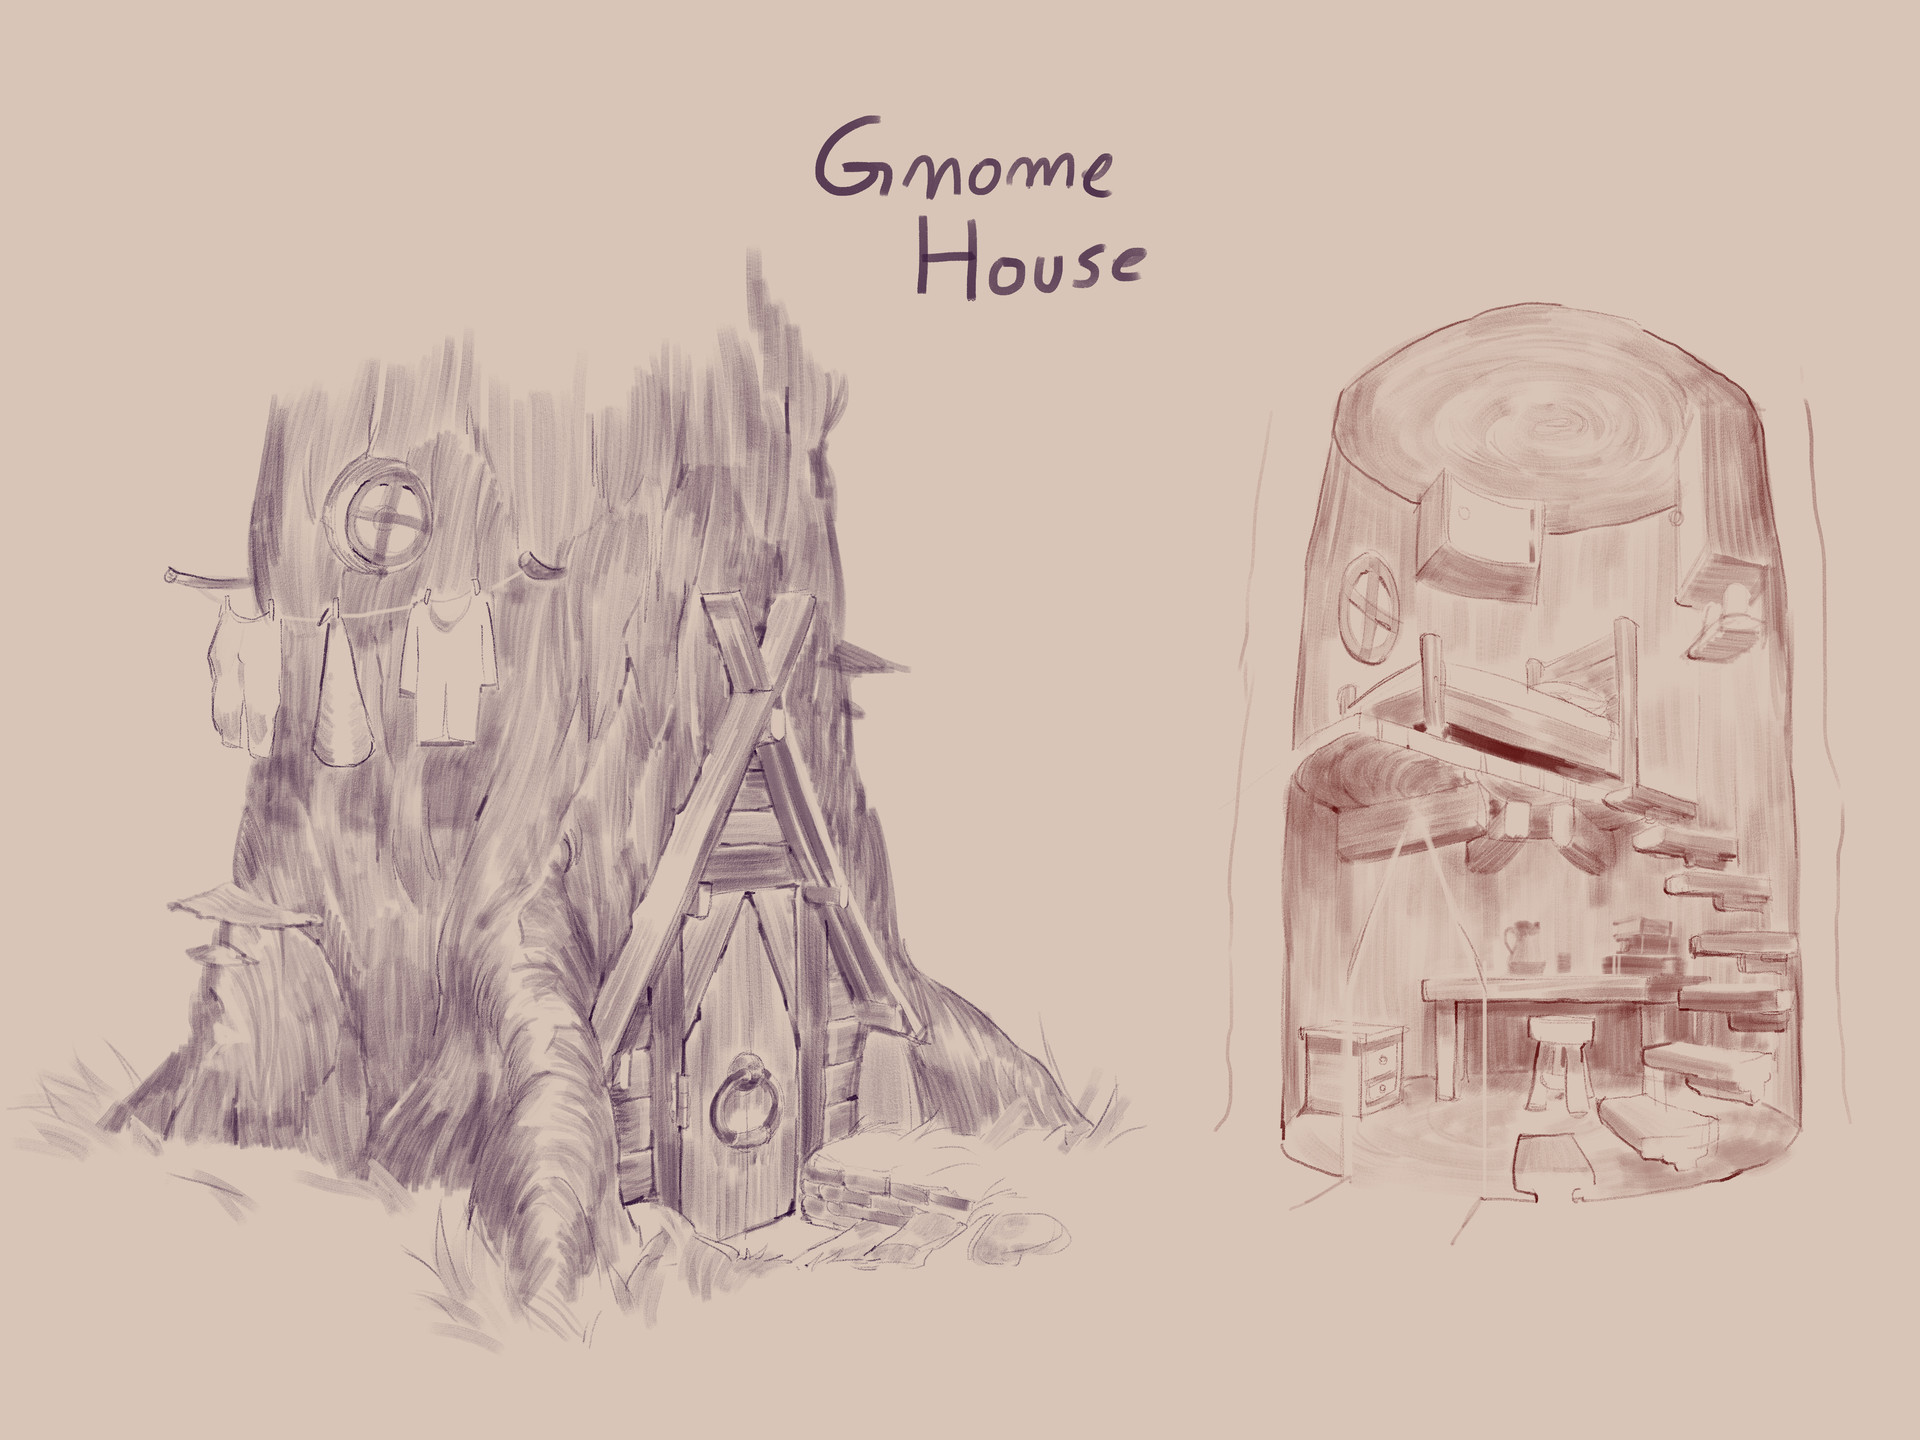 Pedro kruger garcia gnome house exploration